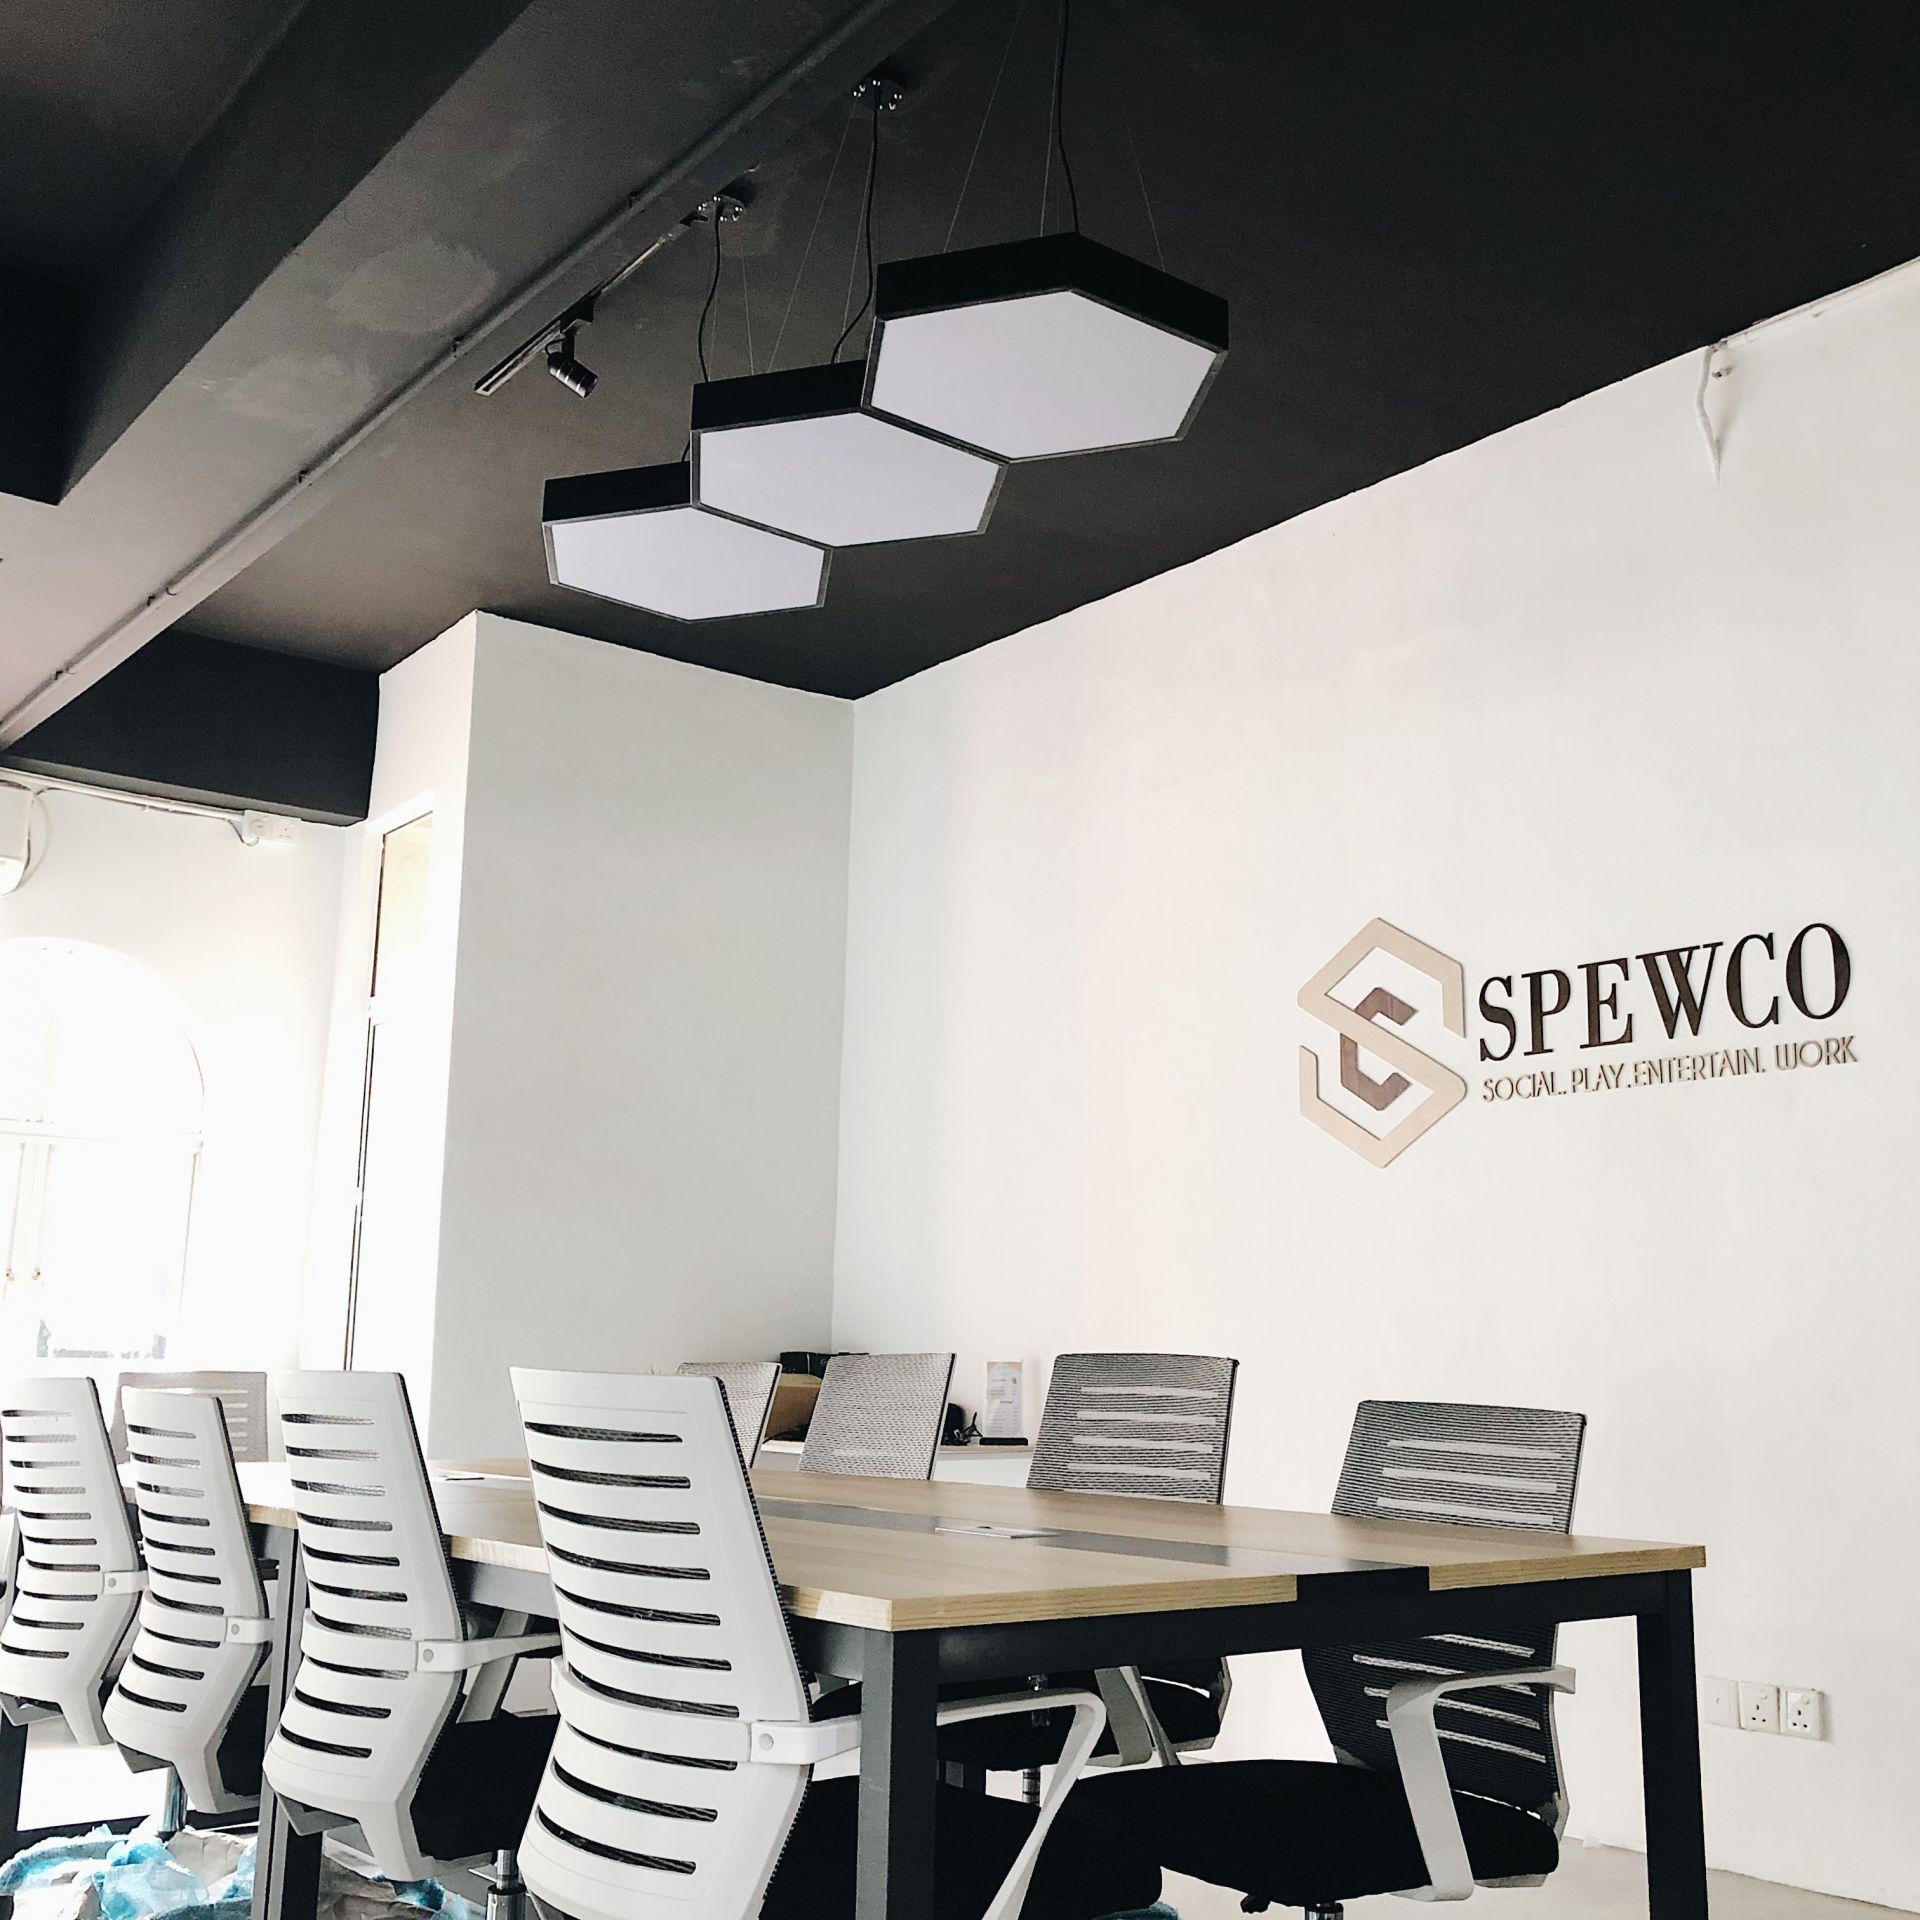 Spewco, Petaling Jaya